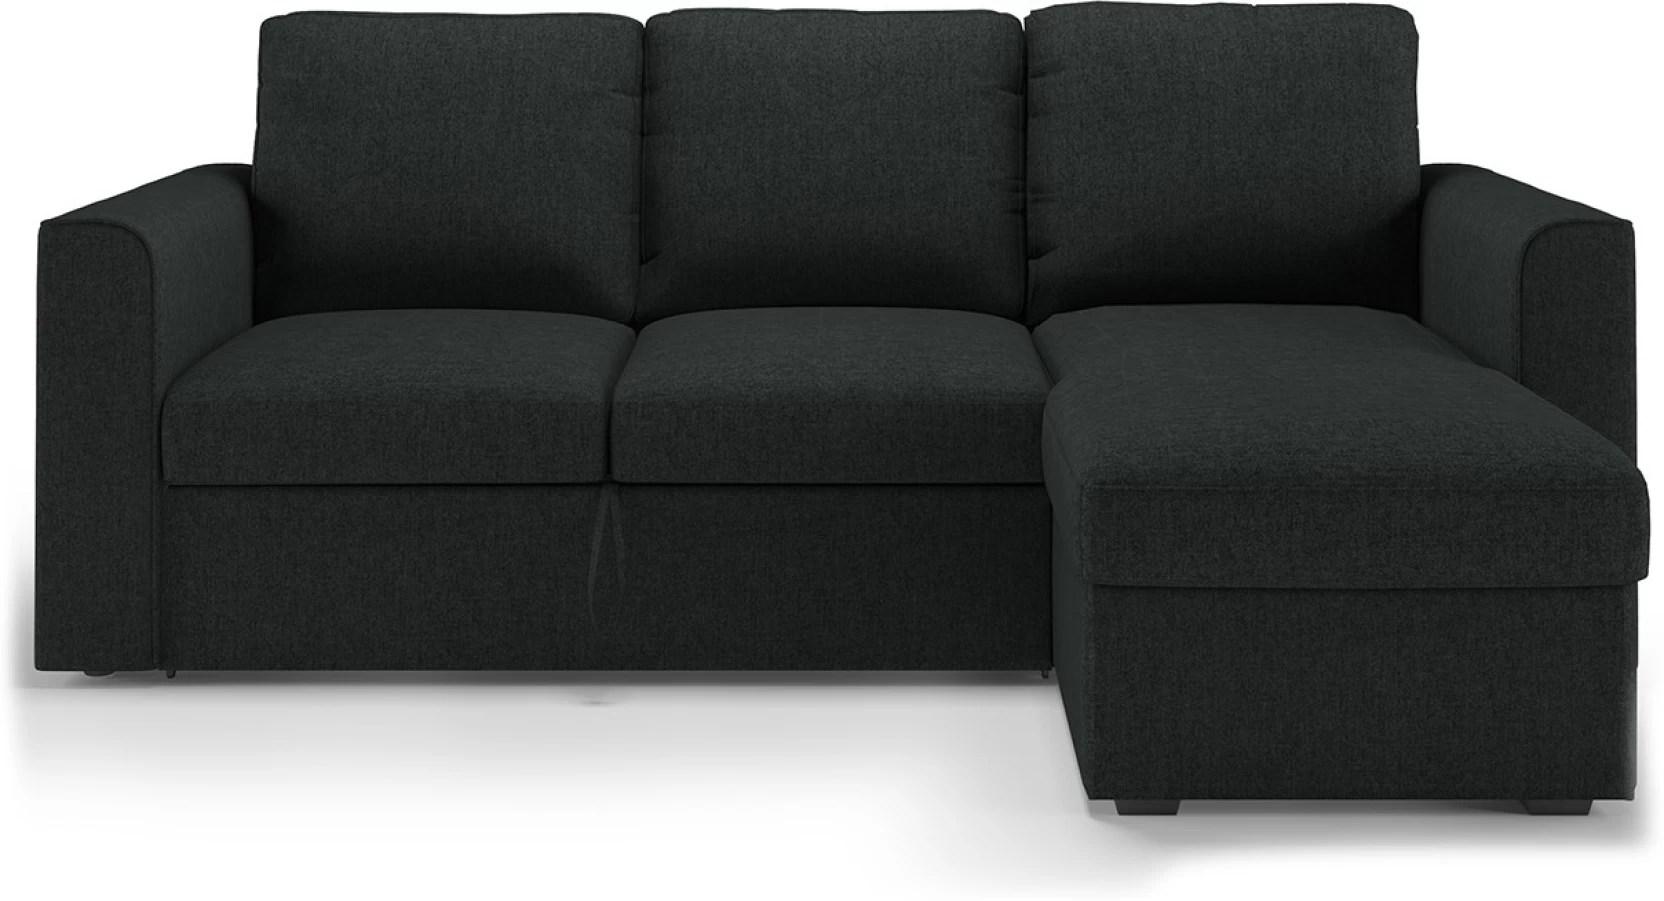 wood sofa bed with storage ashley furniture alenya reviews urban ladder kowloon sectional cum